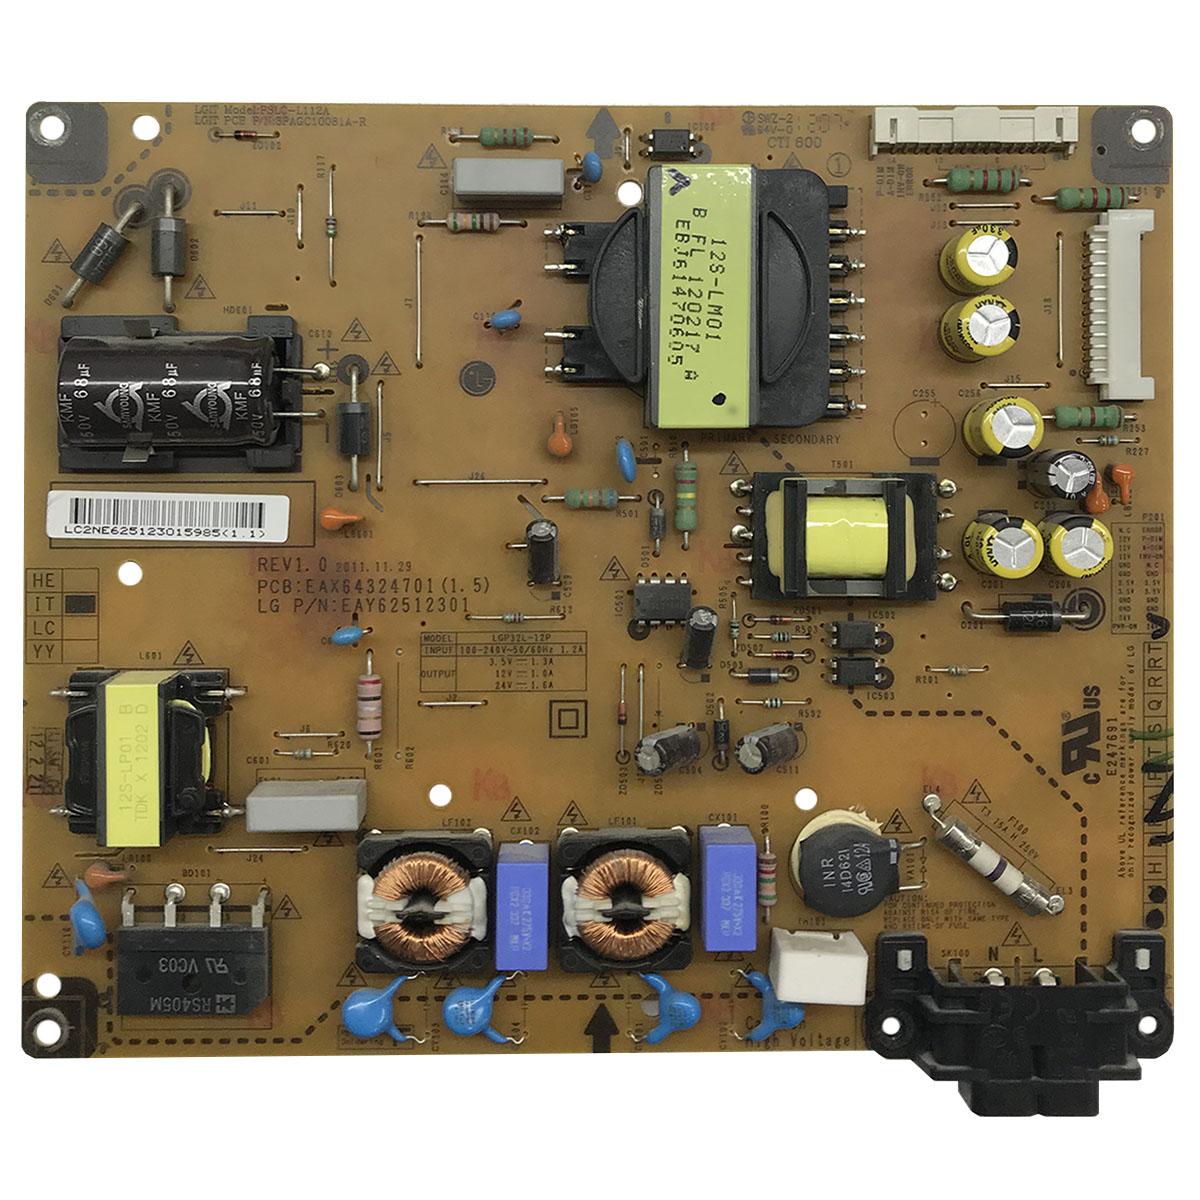 Блок питания EAX64324701(1.5) для LG 32LS3500